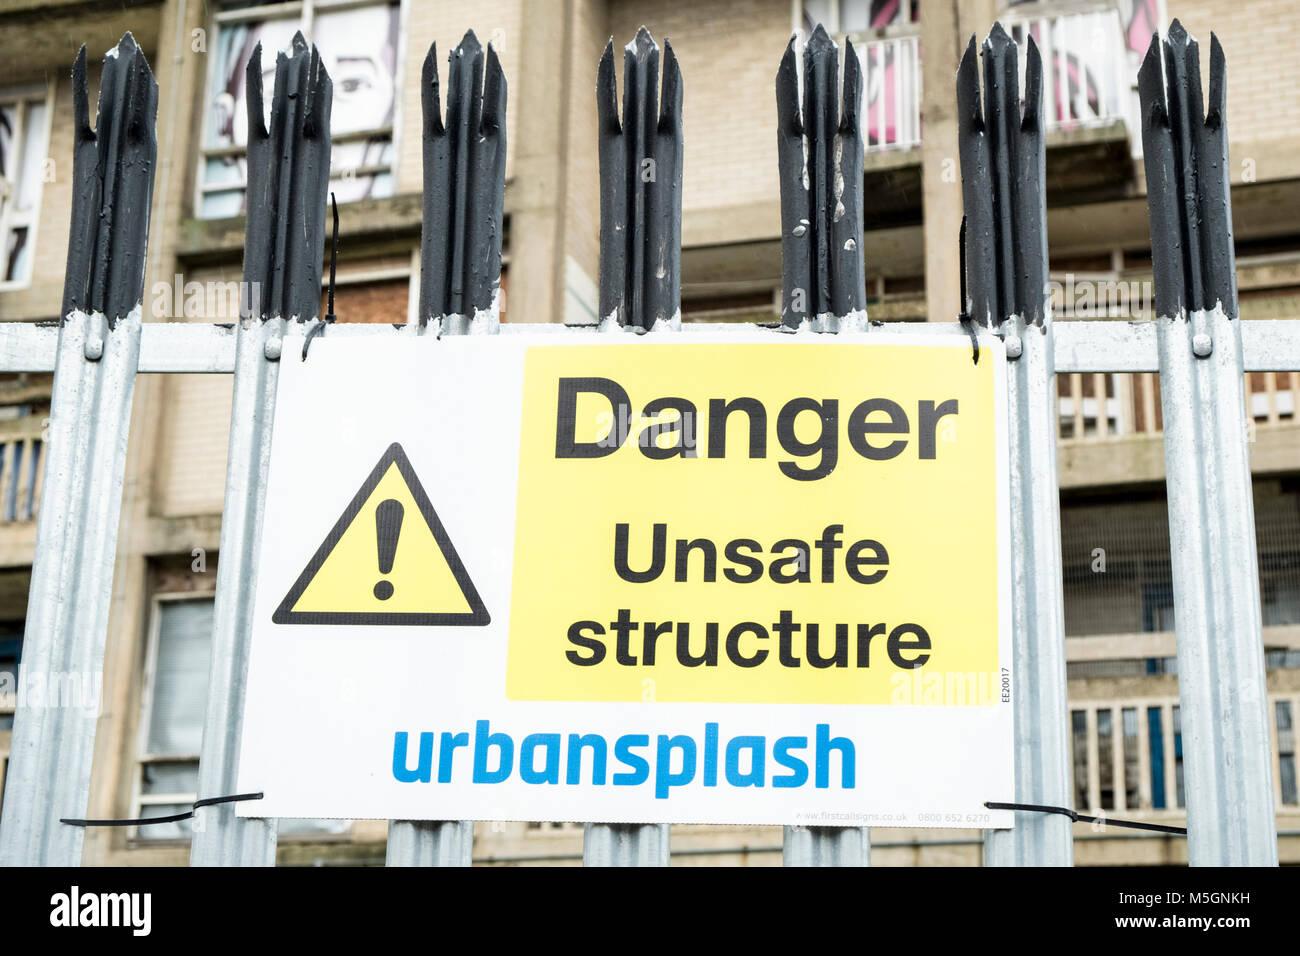 Danger, unsafe structure sign by Urban Splash on security fencing, Park Hill, Sheffield, England, UK.   Urban Splash - Stock Image